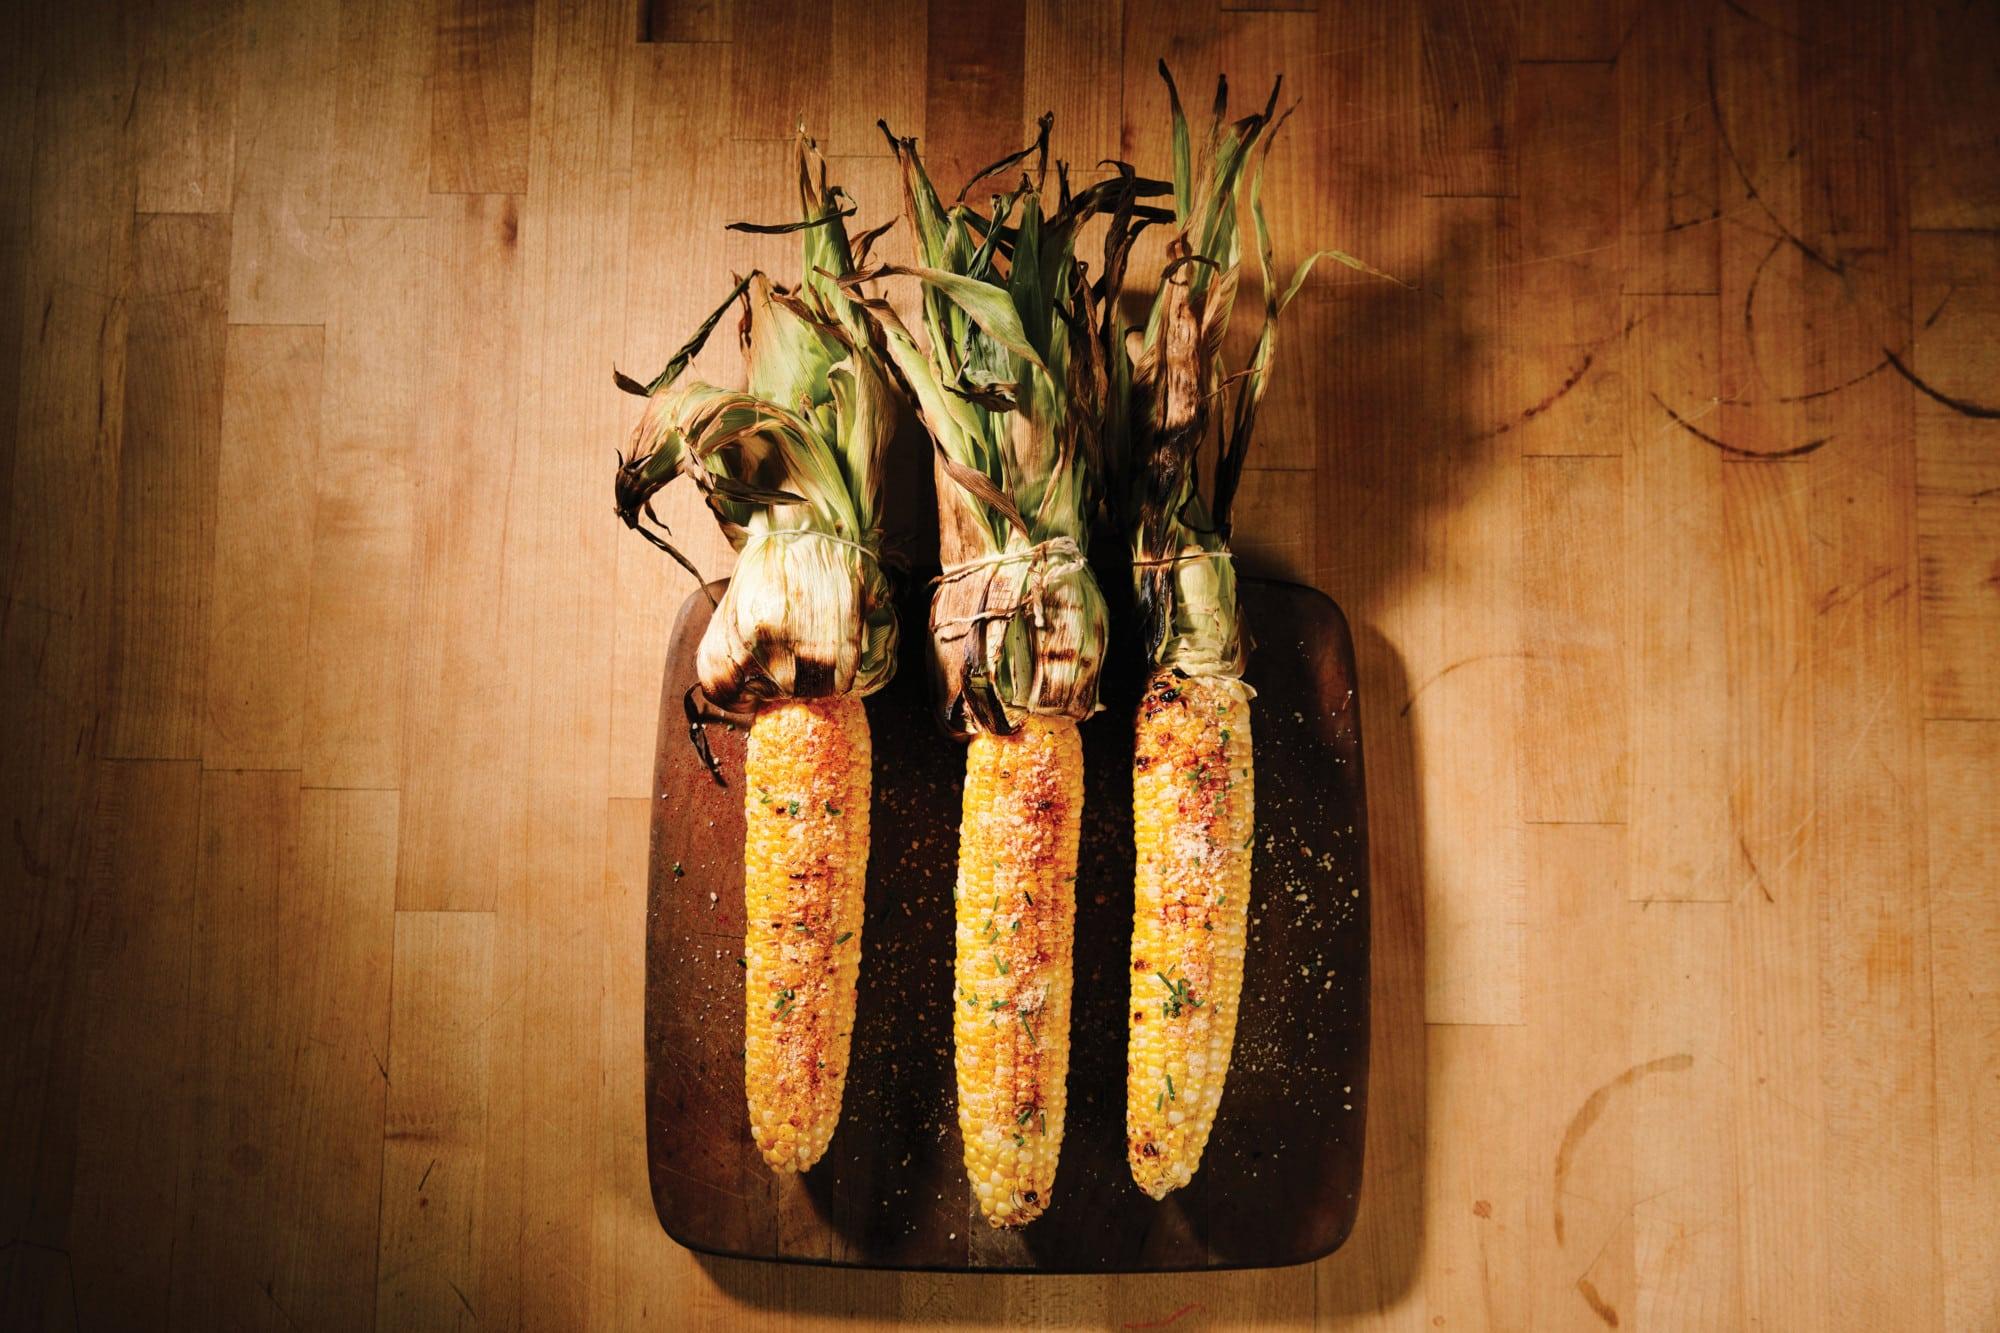 Three cobs of corn.